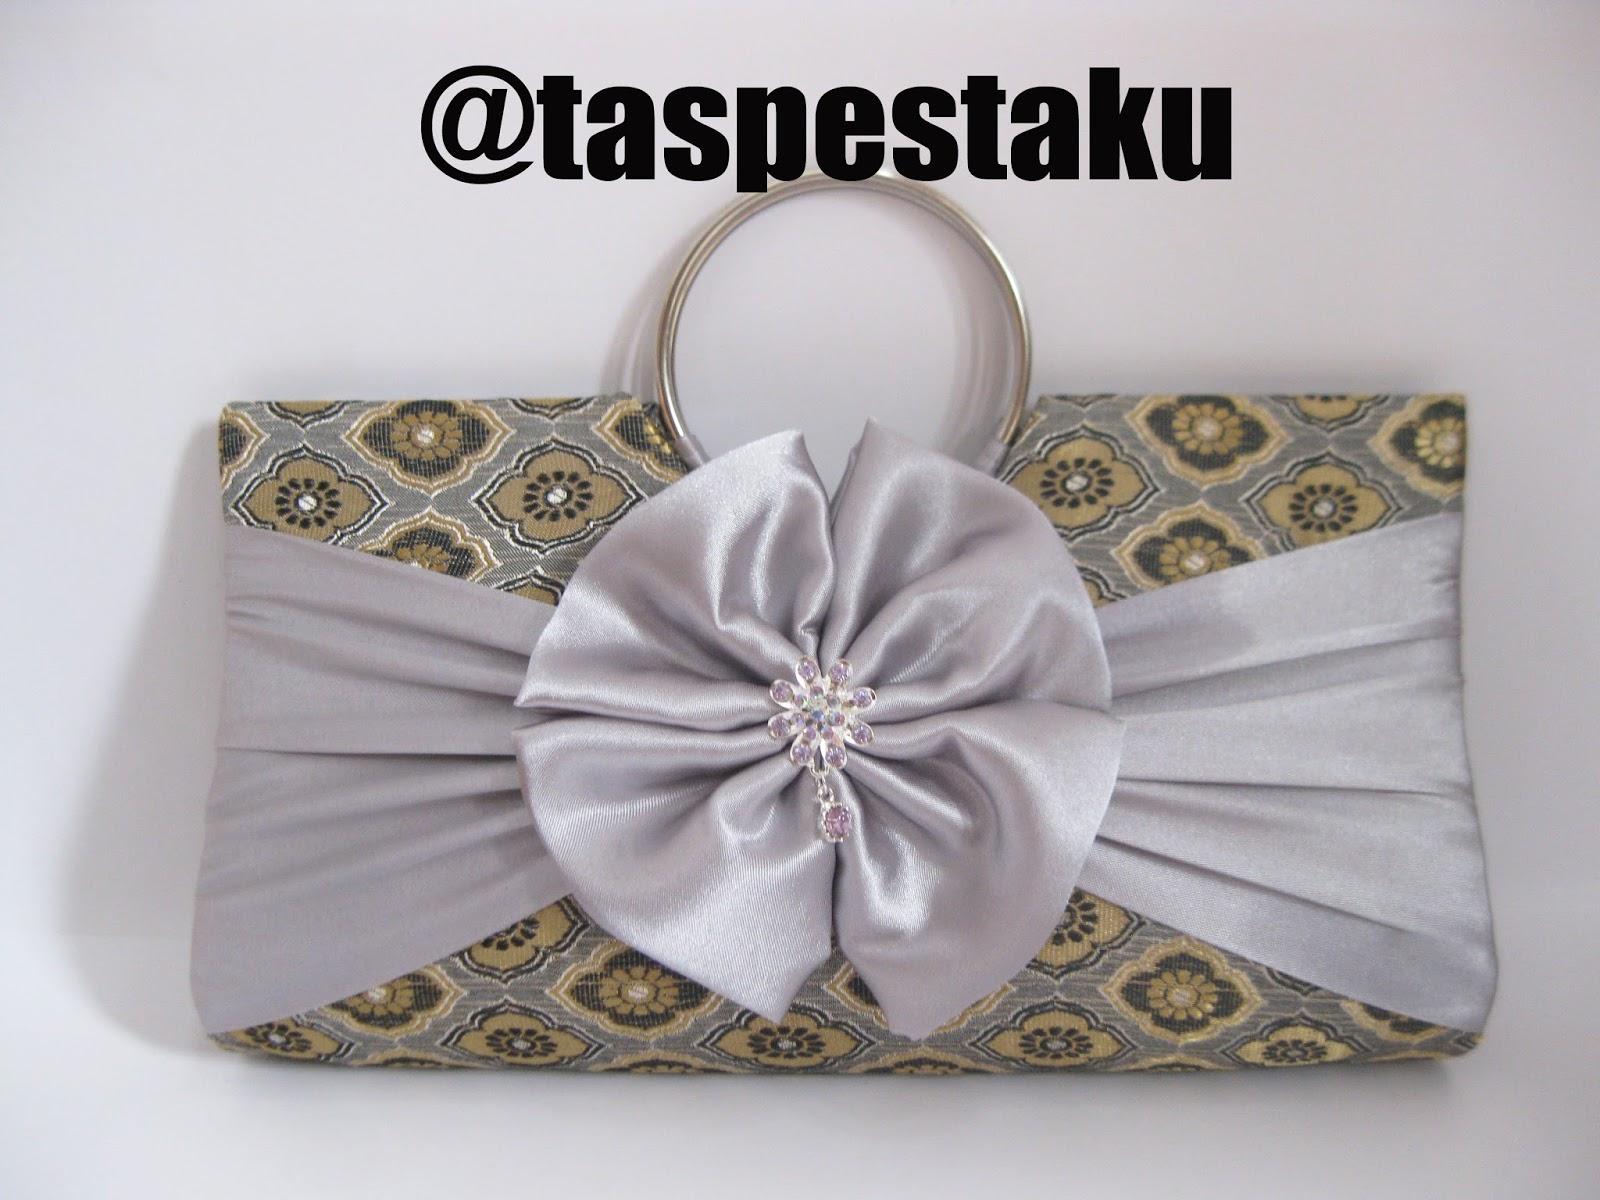 Handmade Tas Pesta Mewah Bahan Mirip S gket Sari India SIlver Bisa Customized Warna